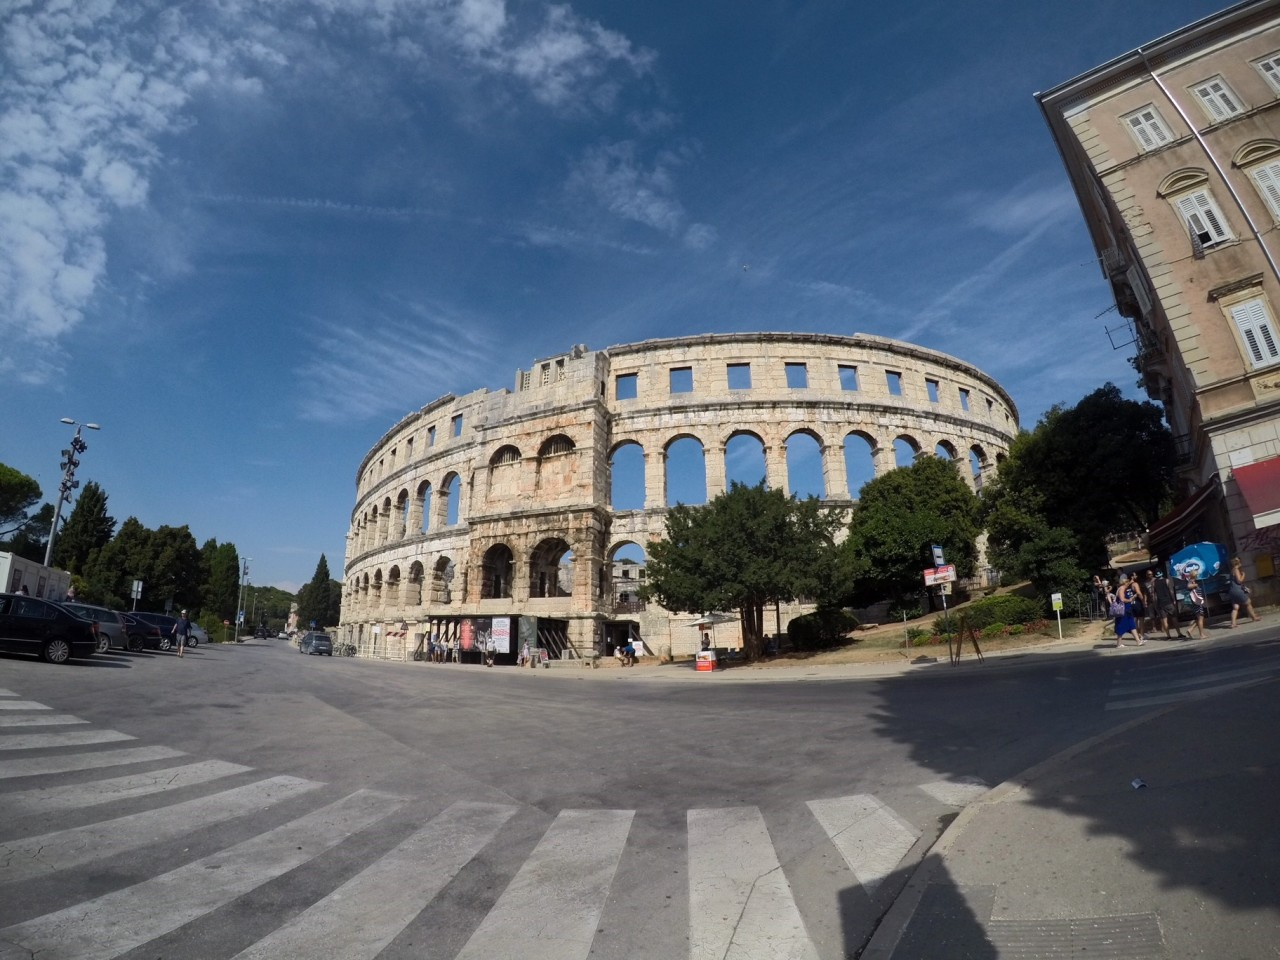 The outside of the Pula colosseum